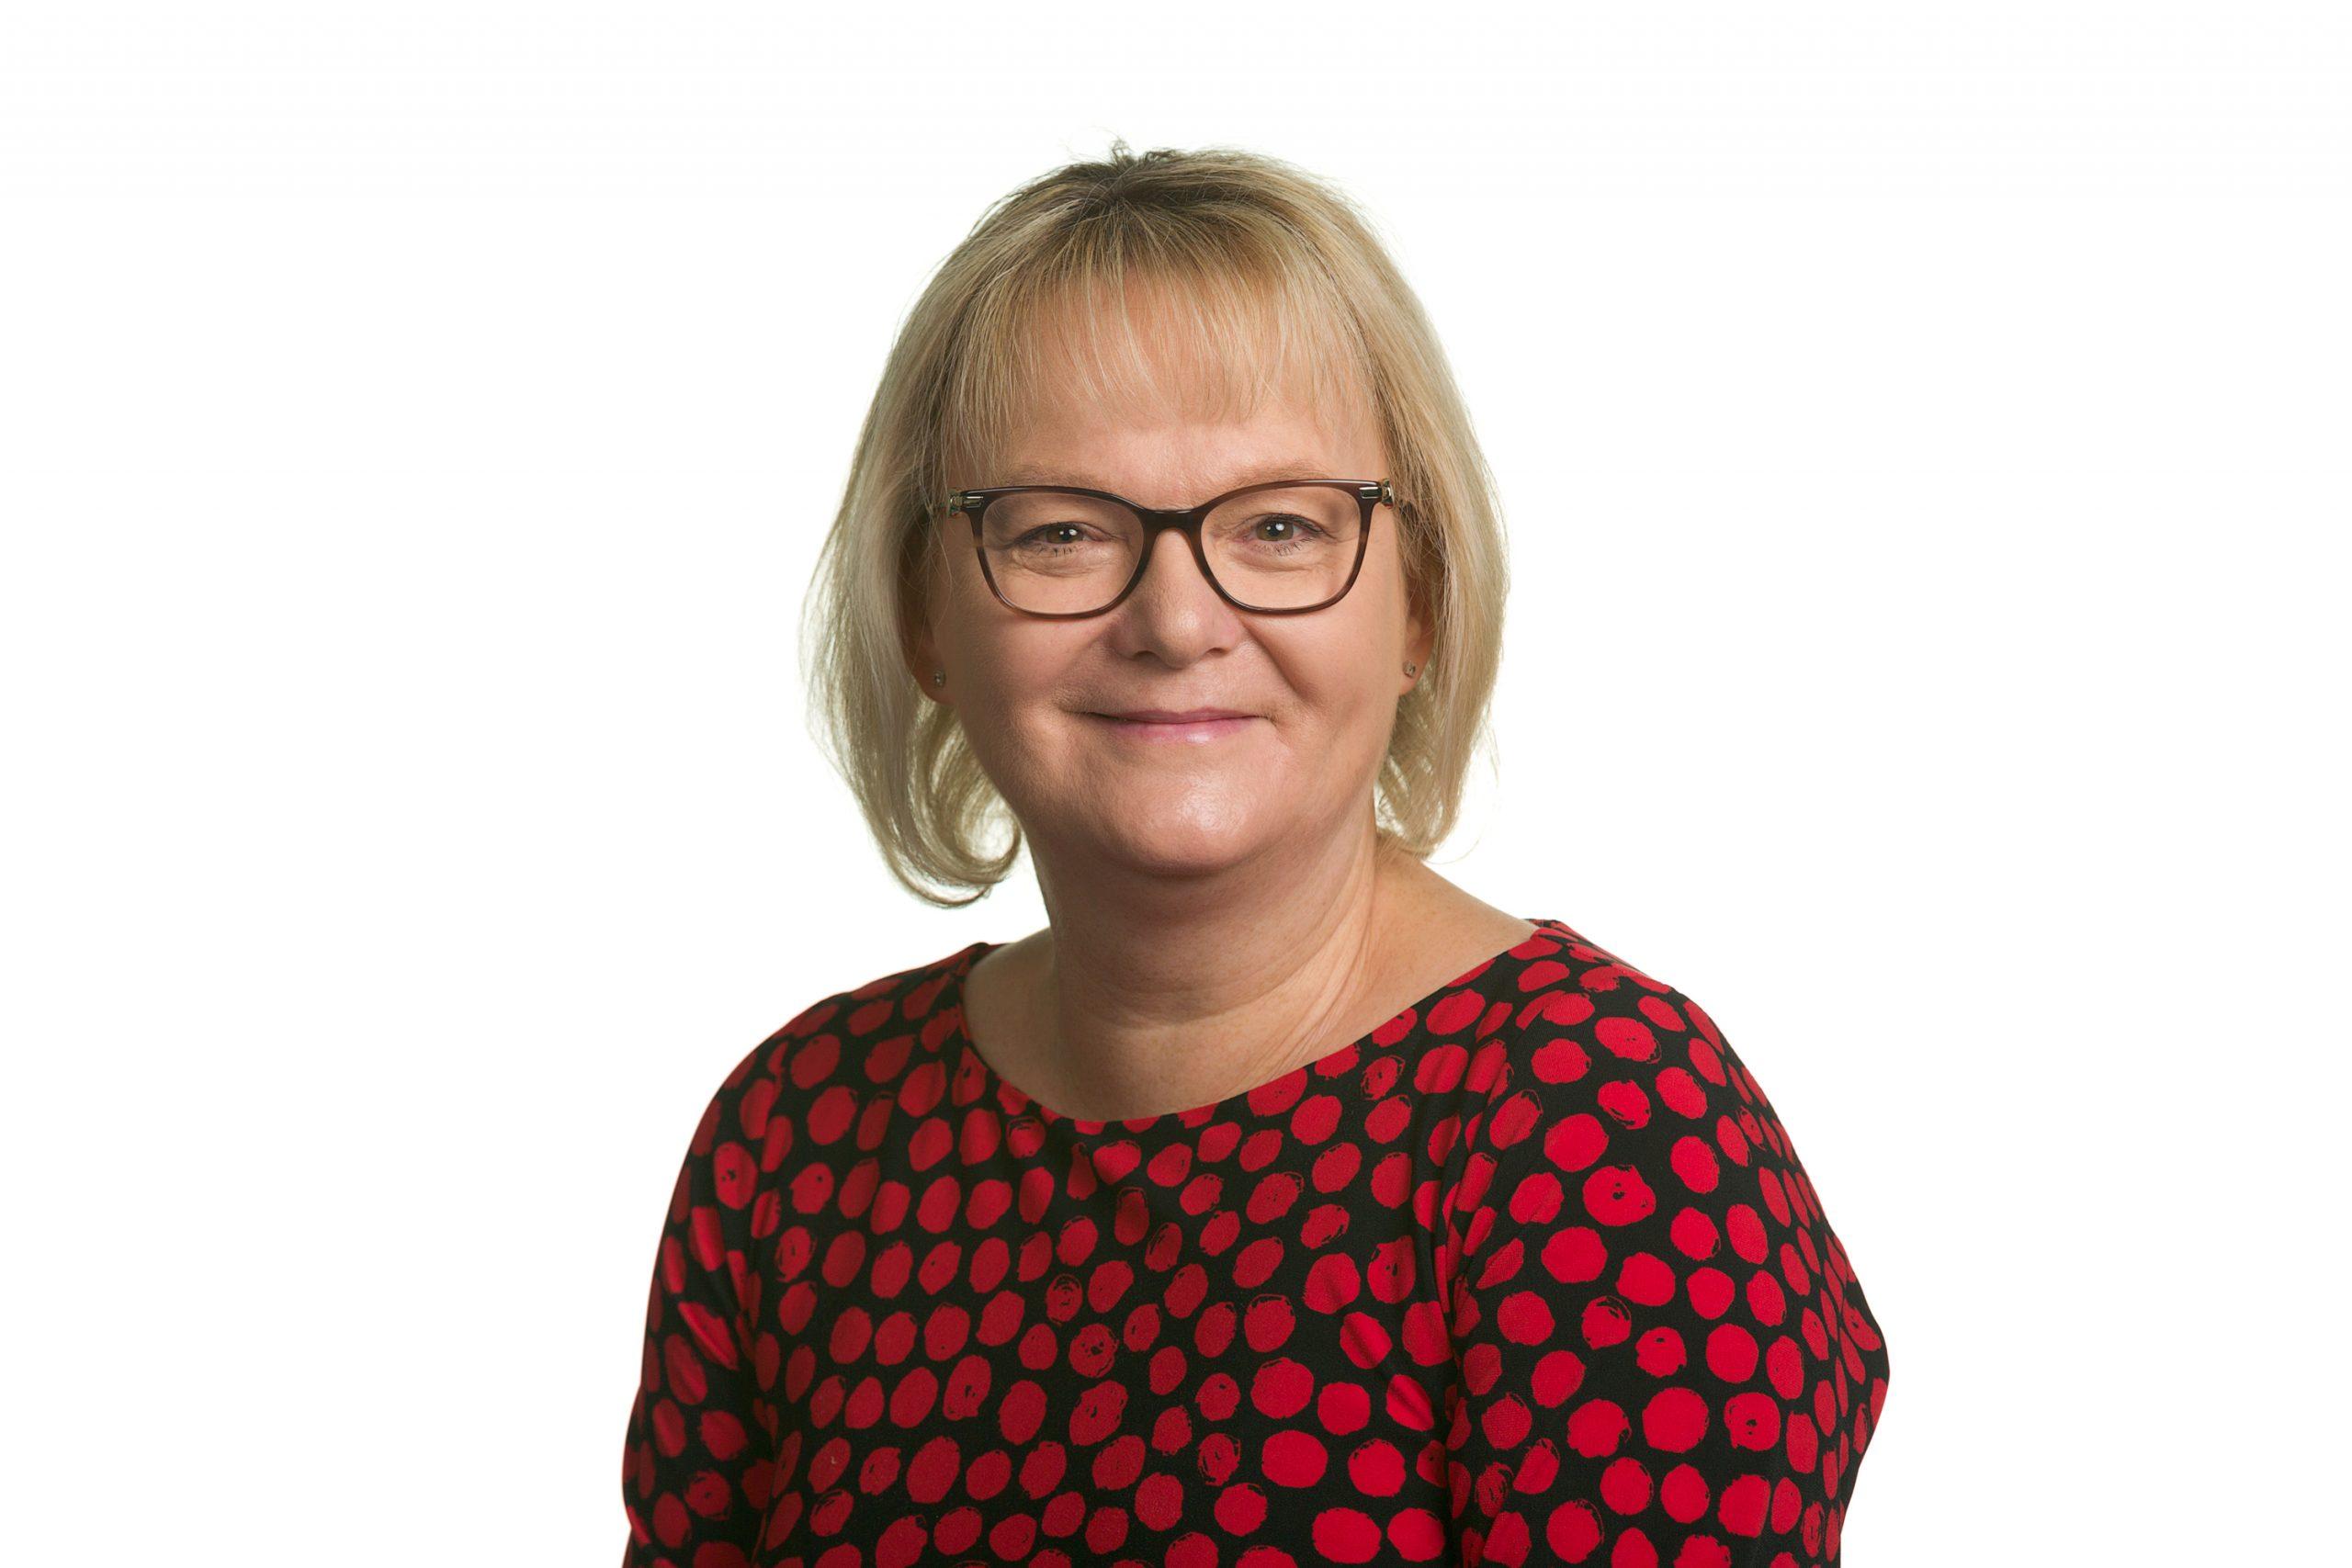 Denise Hunt - Head of Programmes at SMI